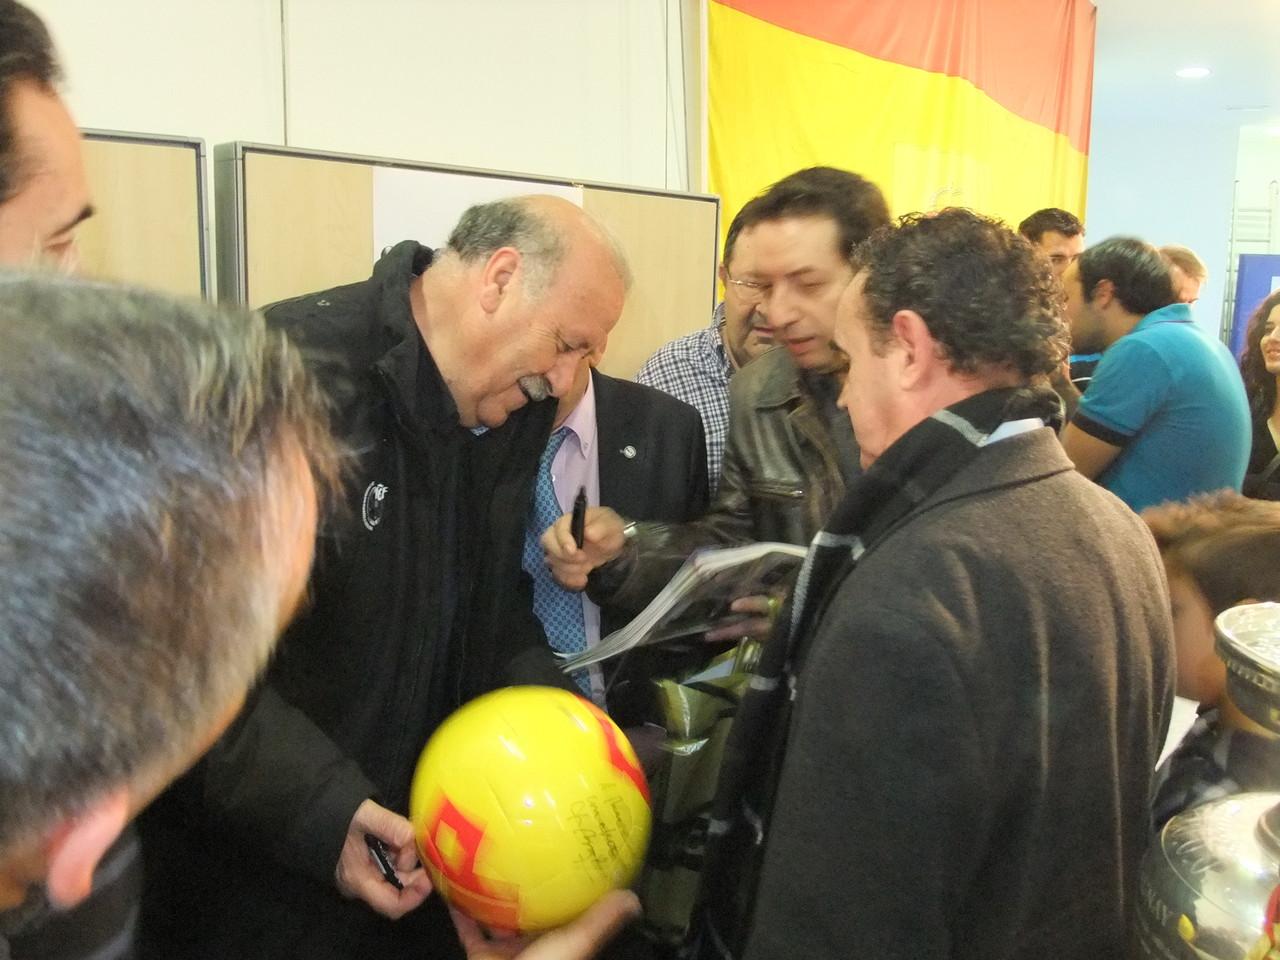 Moderno Profesor De Deportes Reanudar Muestras Festooning - Ejemplo ...